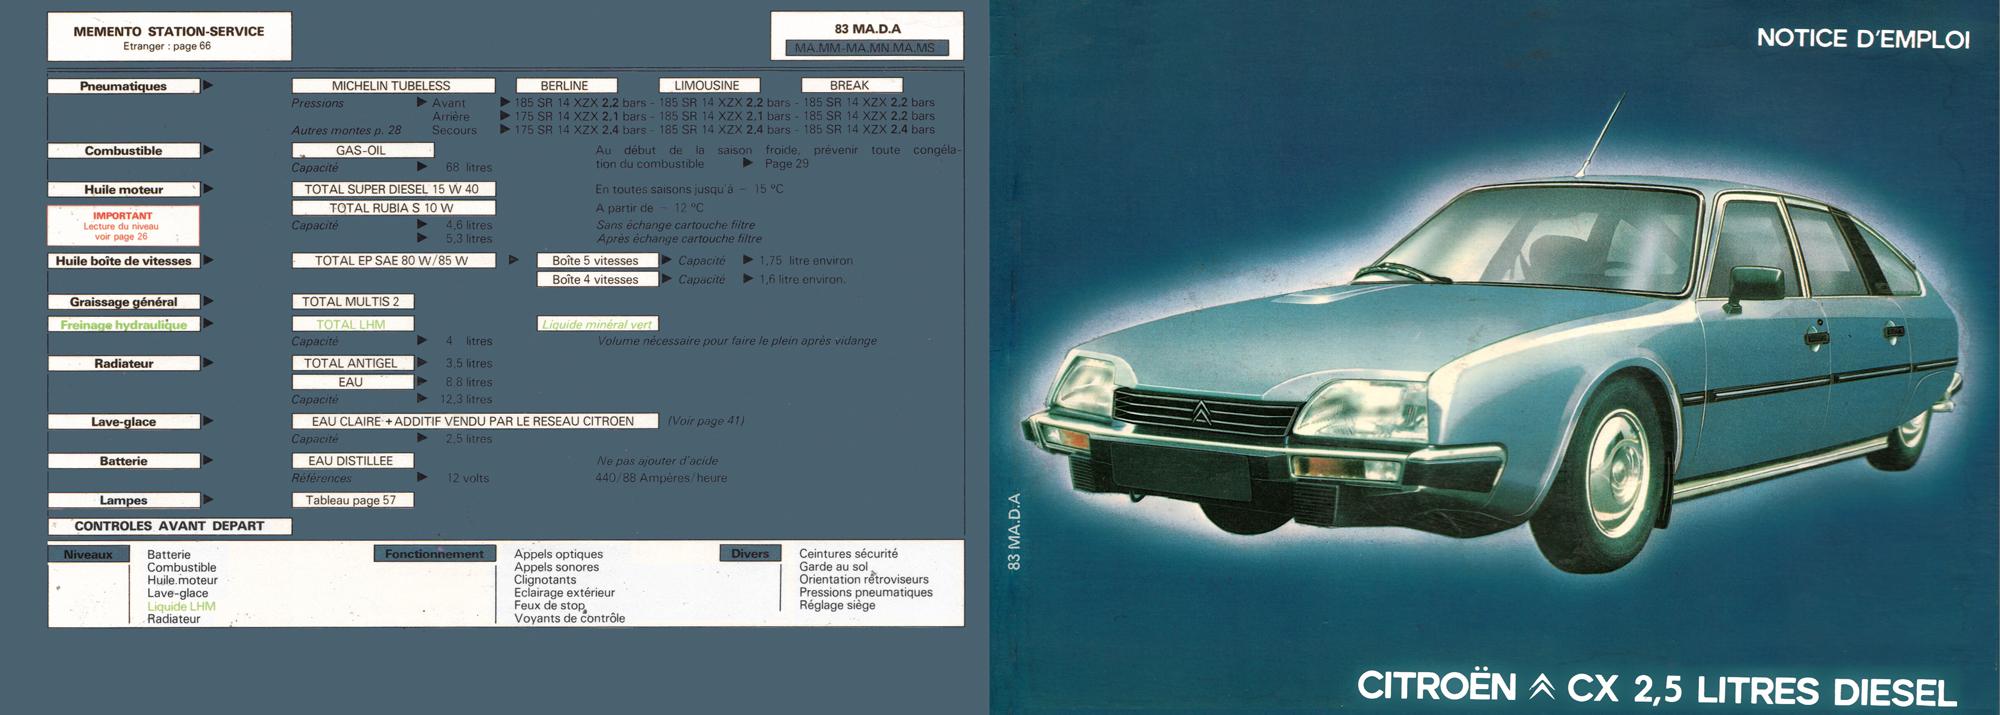 1983 citro n cx 2 5 litres diesel owner s manual rh citroenet org uk Citroen XM citroen cx owners manual pdf